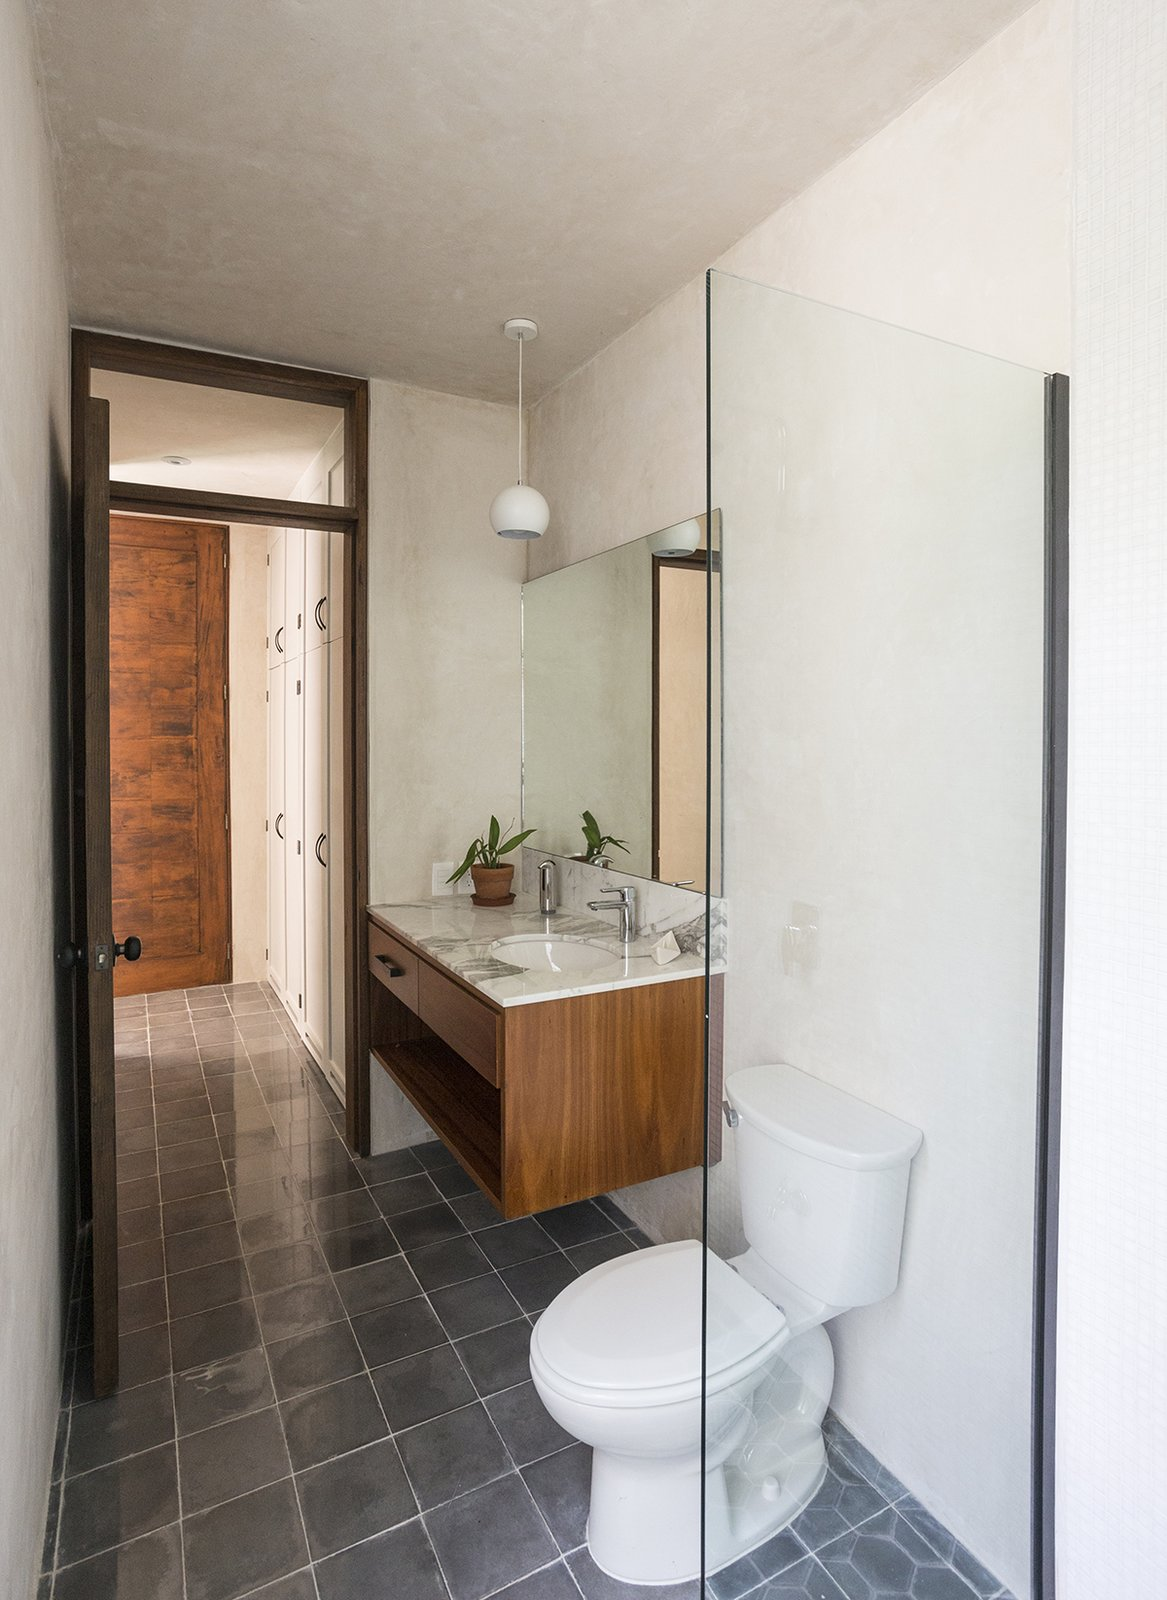 Bath Room, Marble Counter, Undermount Sink, and Cement Tile Floor Downstairs bathroom  Lemon Tree House by Taller Estilo Arquitectura S de R.L de C.V